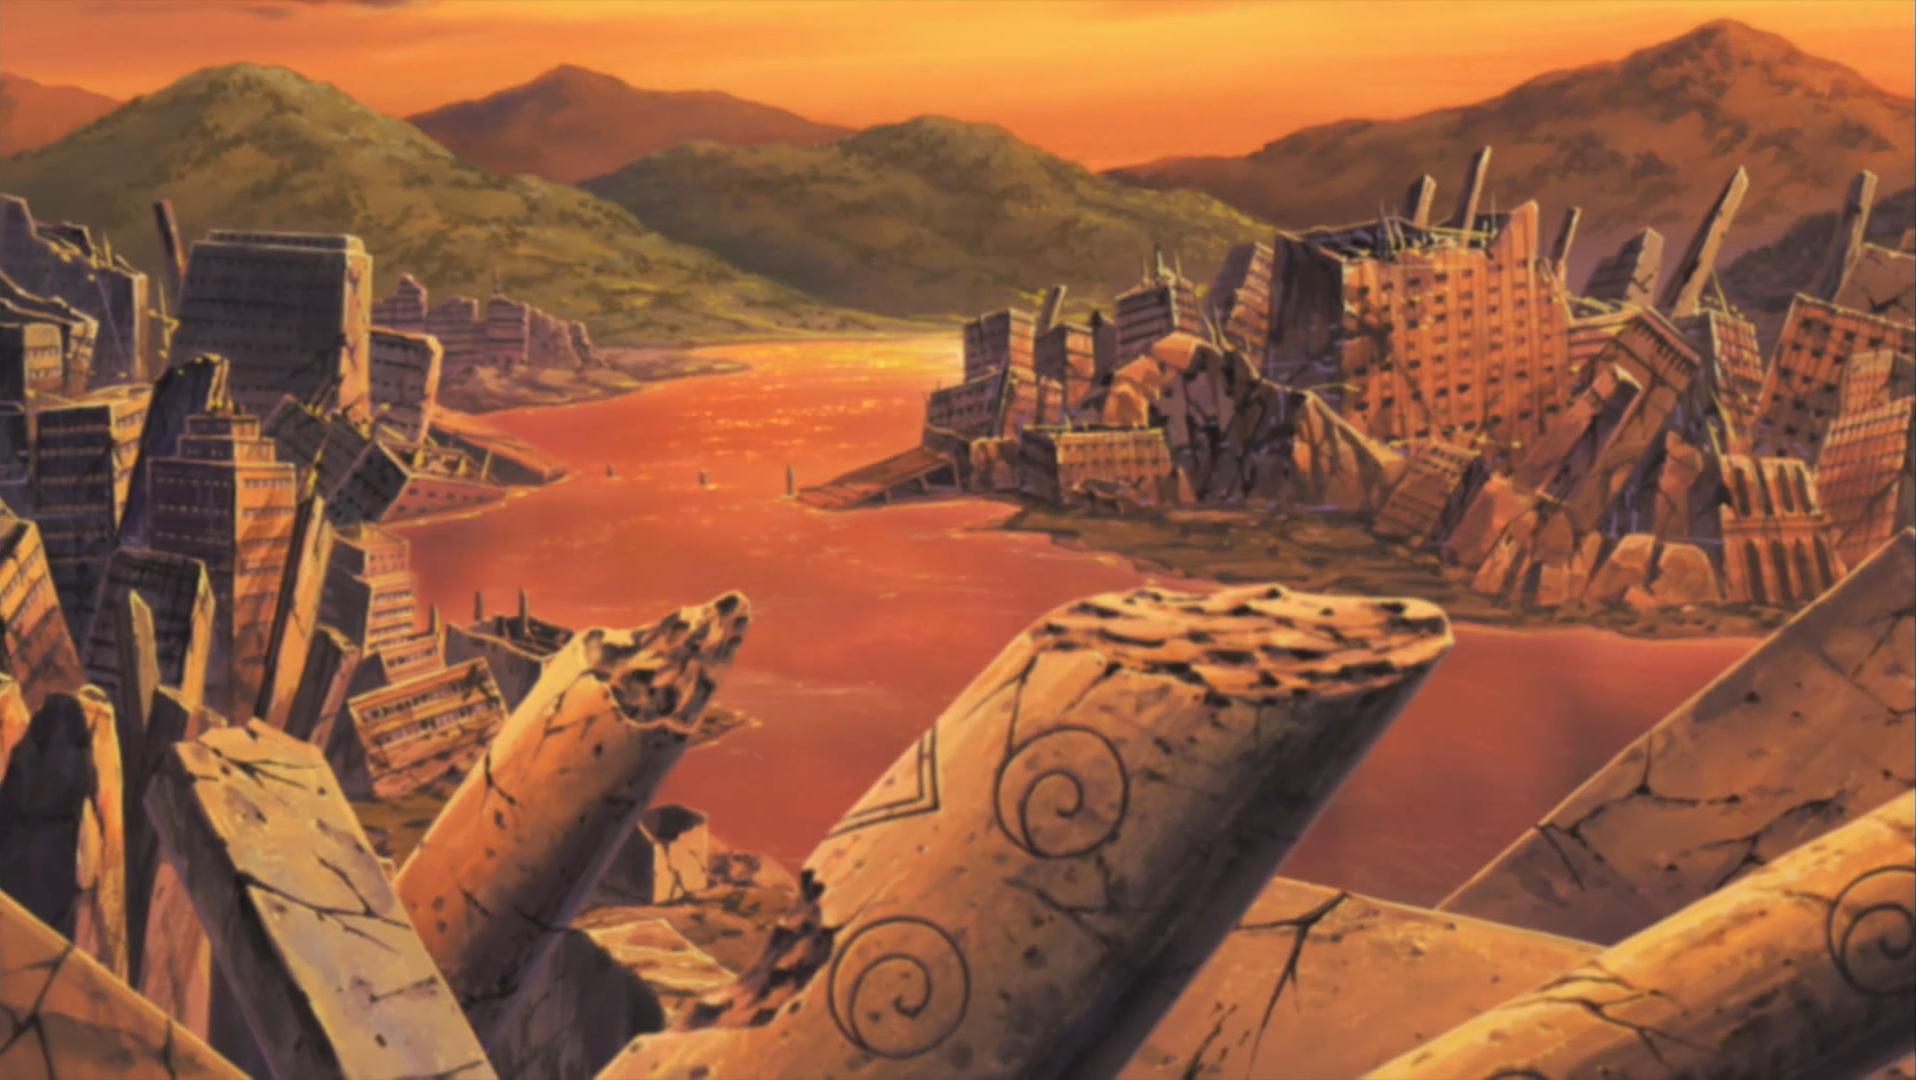 Legacy (Naruto x Worm) | SpaceBattles Forums